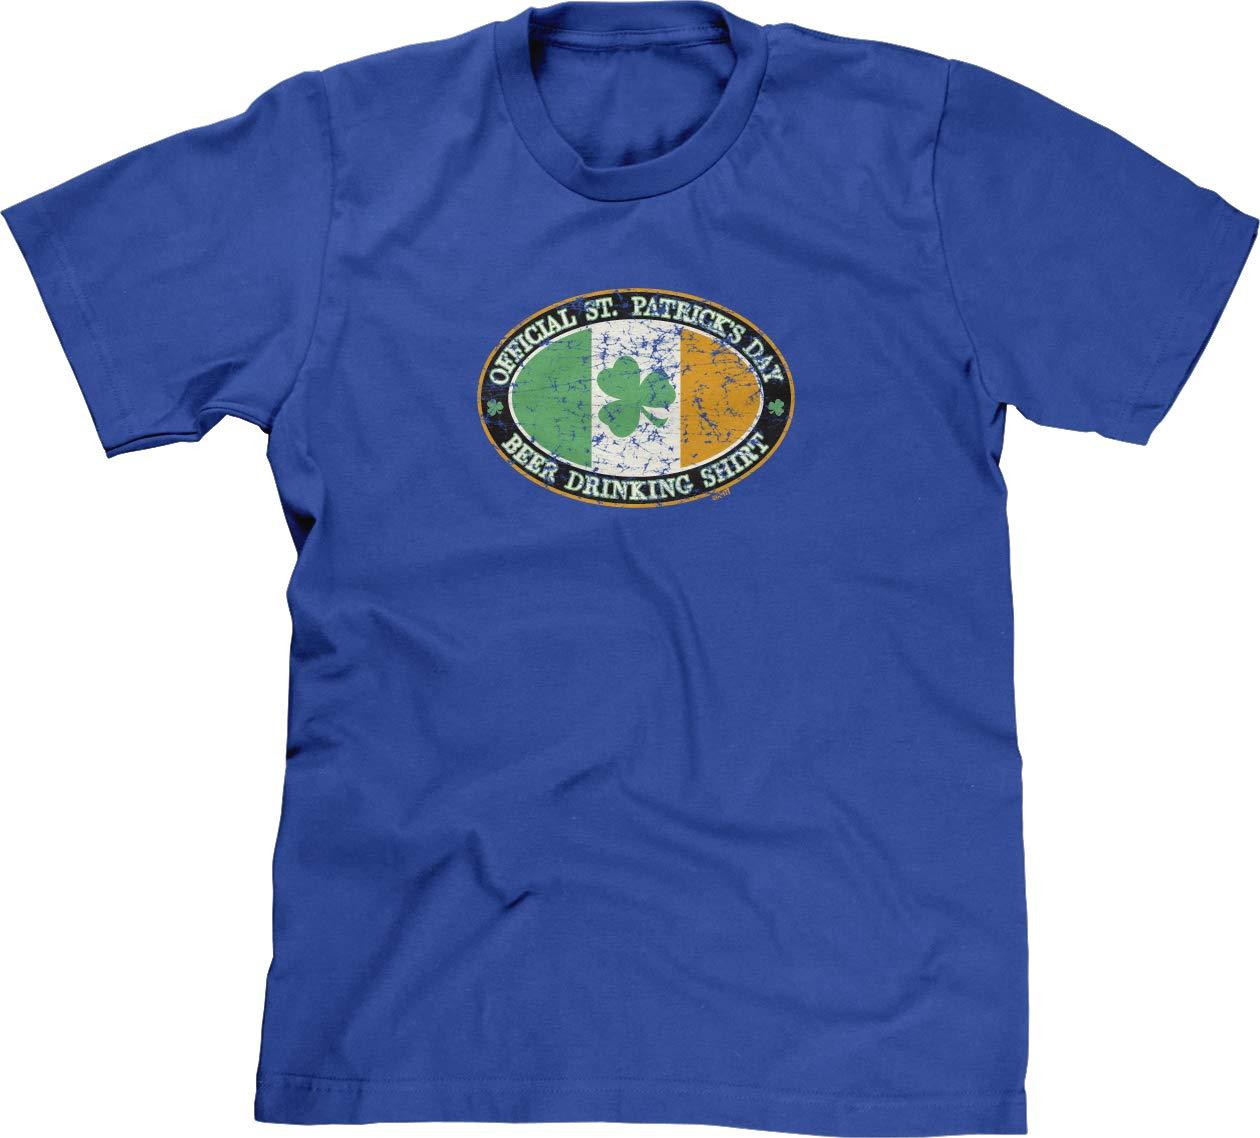 S Tshirt St Patricks Day Beer Drinking Shirt